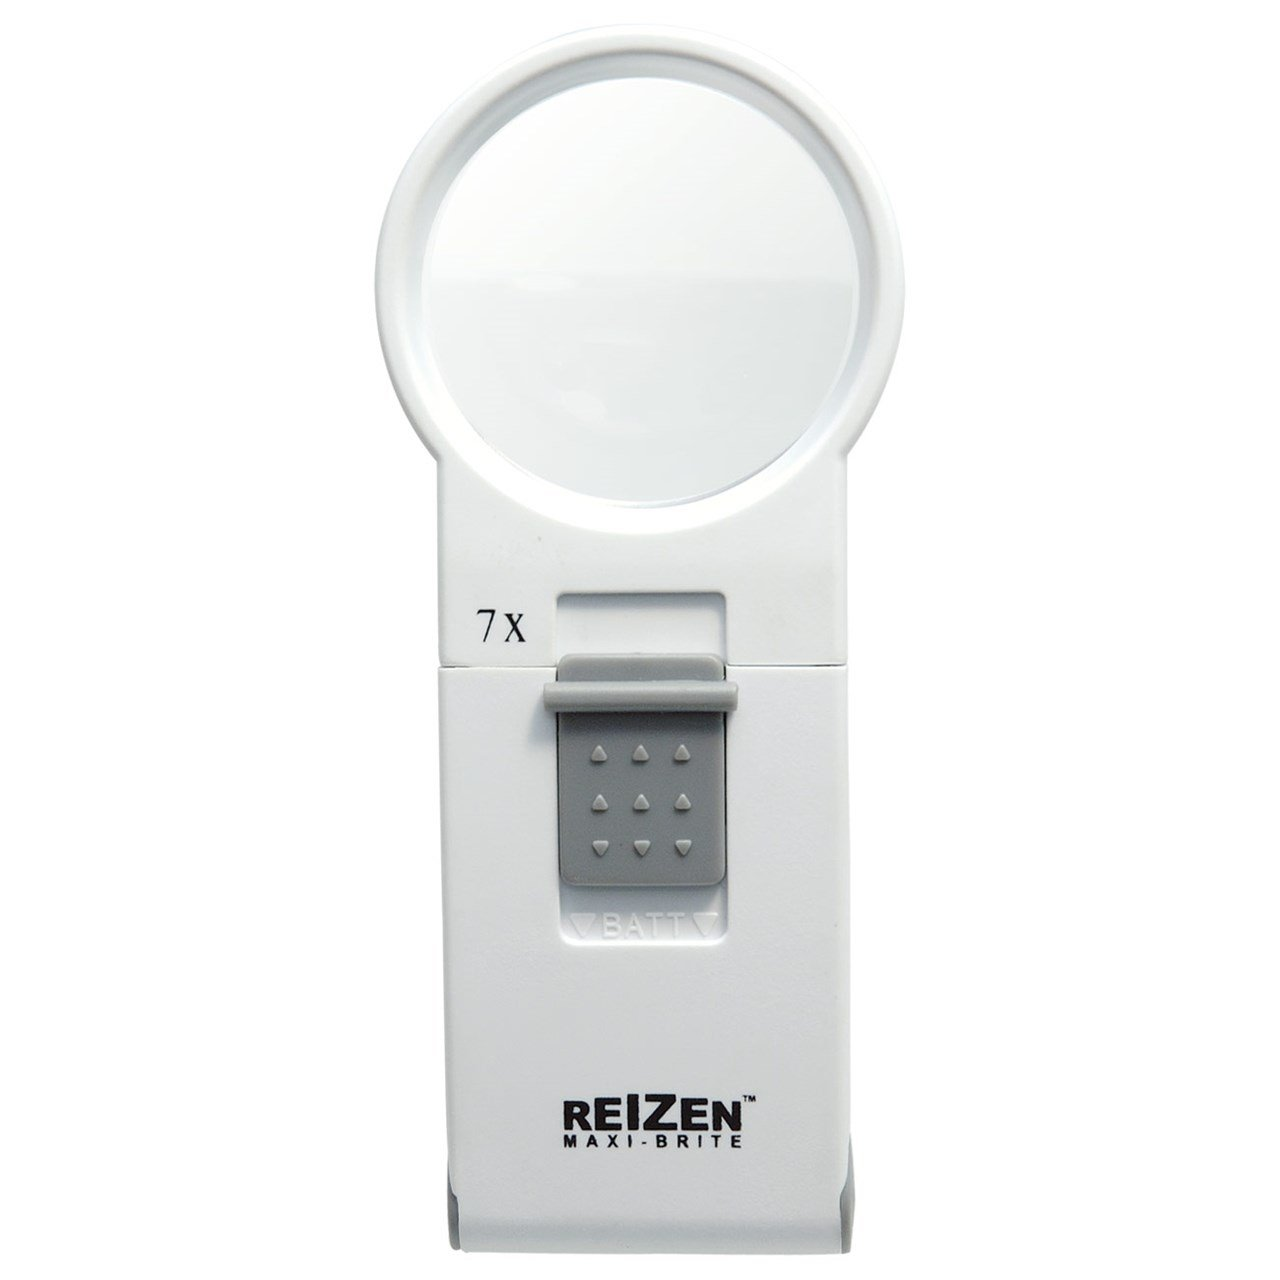 Reizen Maxi-Brite LED Handheld Magnifier - 7X by Reizen